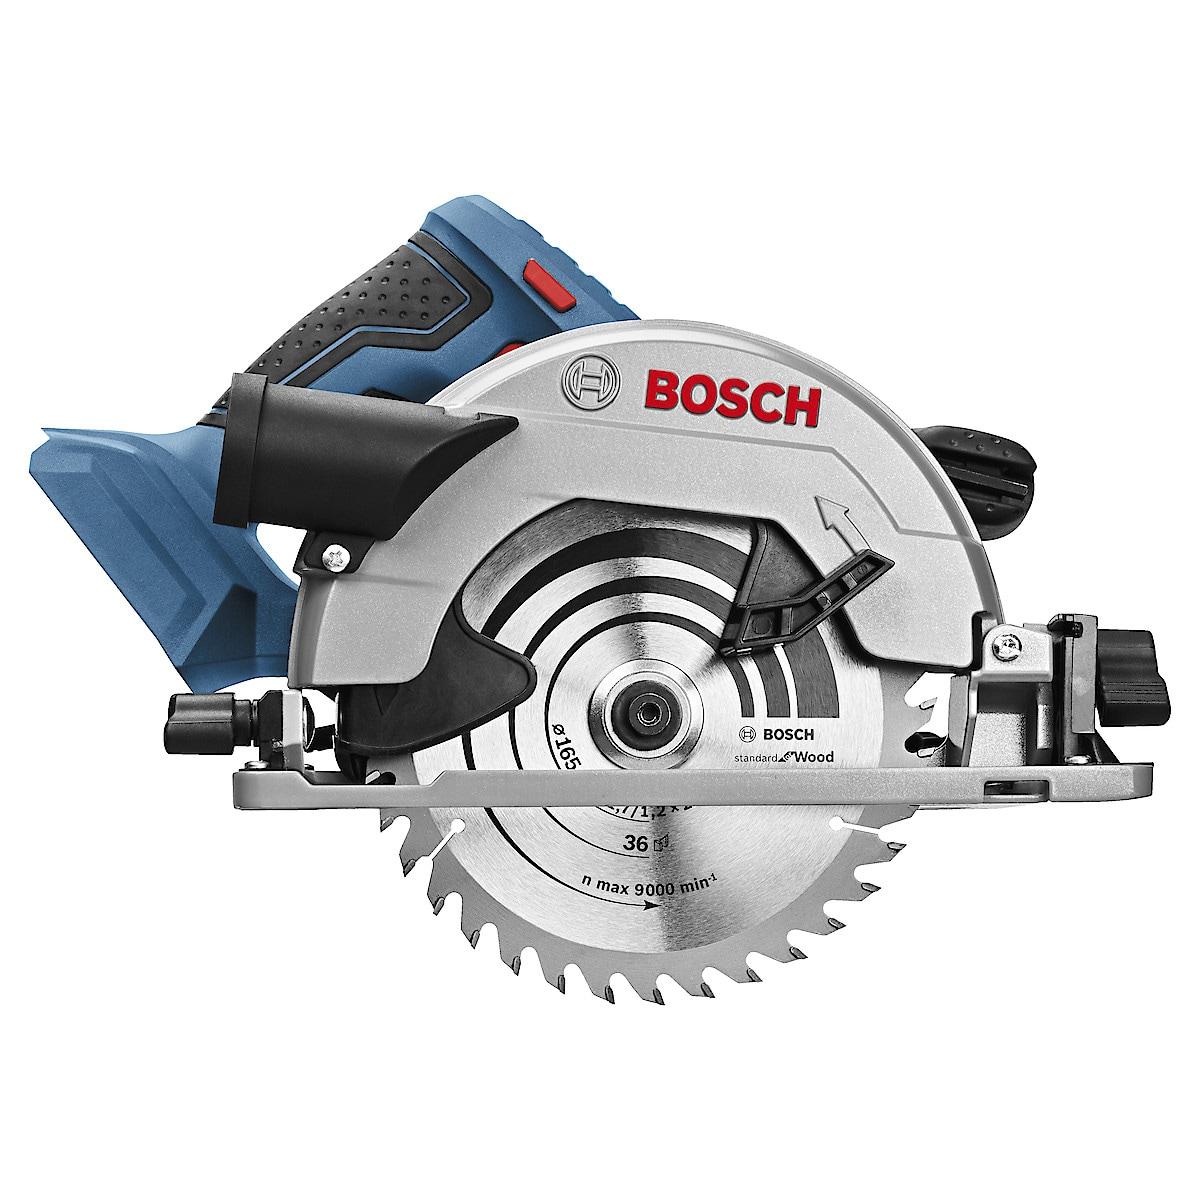 Cirkelsåg Bosch GKS 18V-57 G Professional